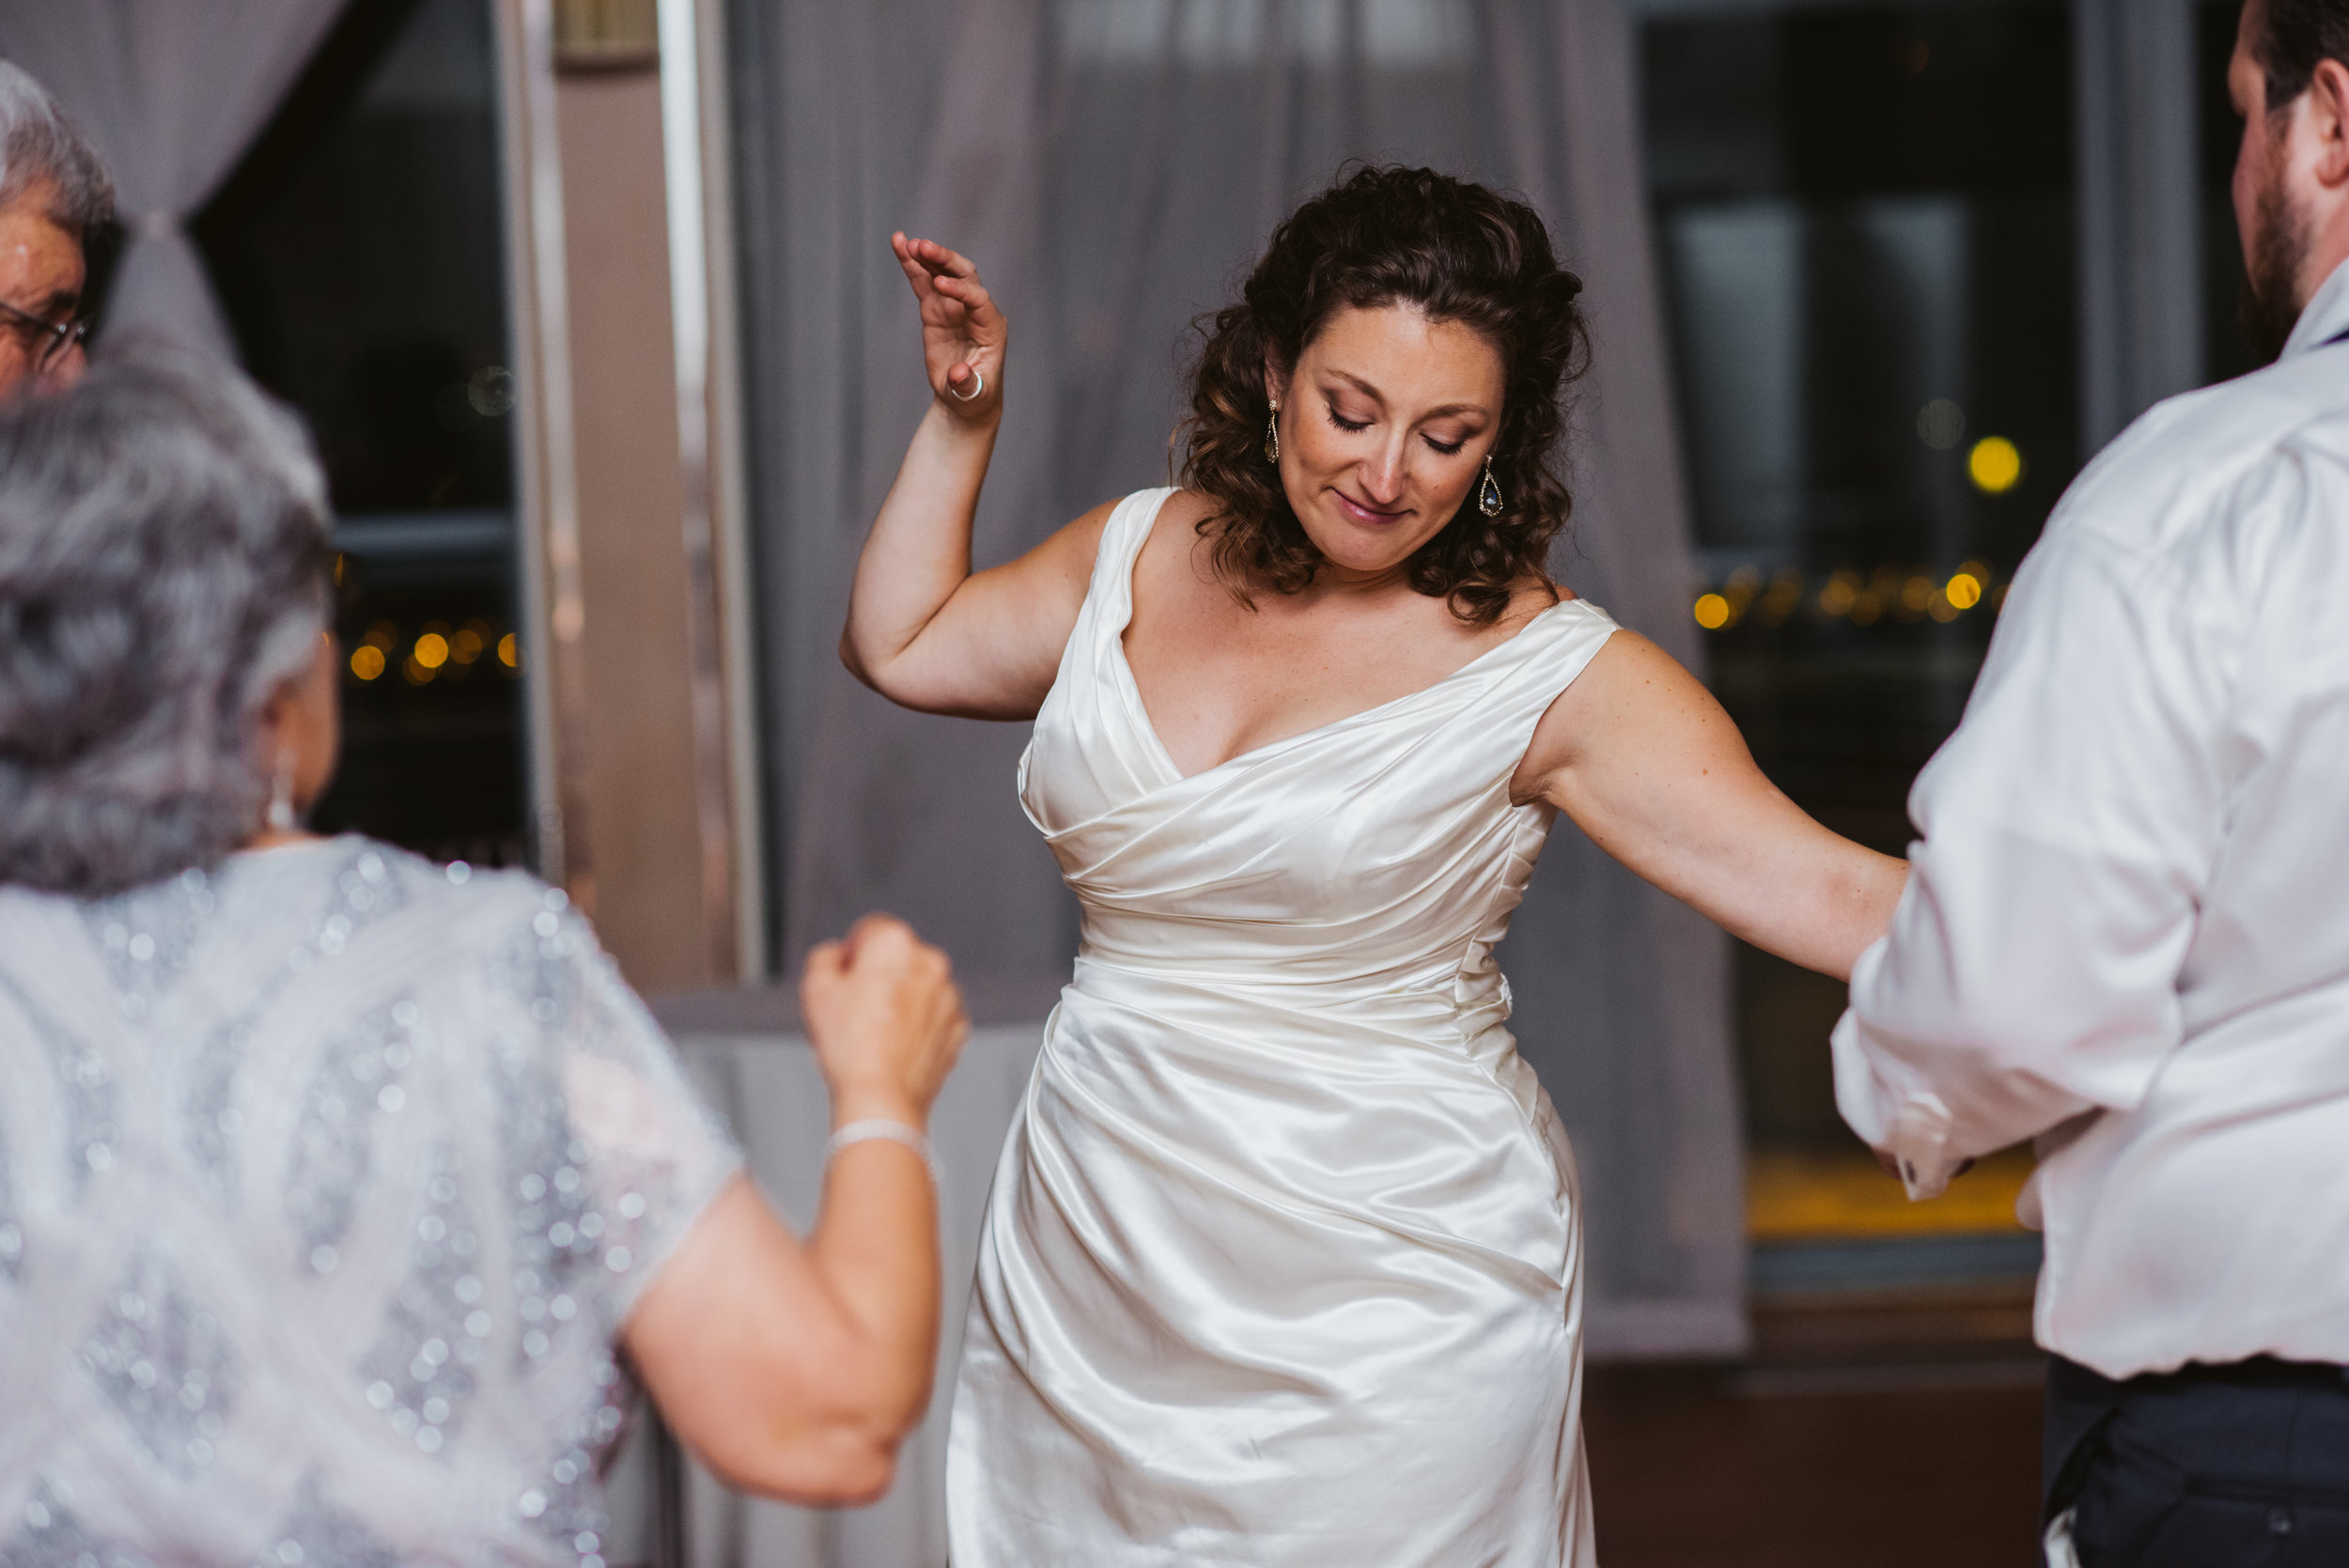 LIZA & JON - BATTERY PARK WEDDING - NYC INTIMATE WEDDING PHOTOGRAPHER - CHI-CHI AGBIM-781.jpg